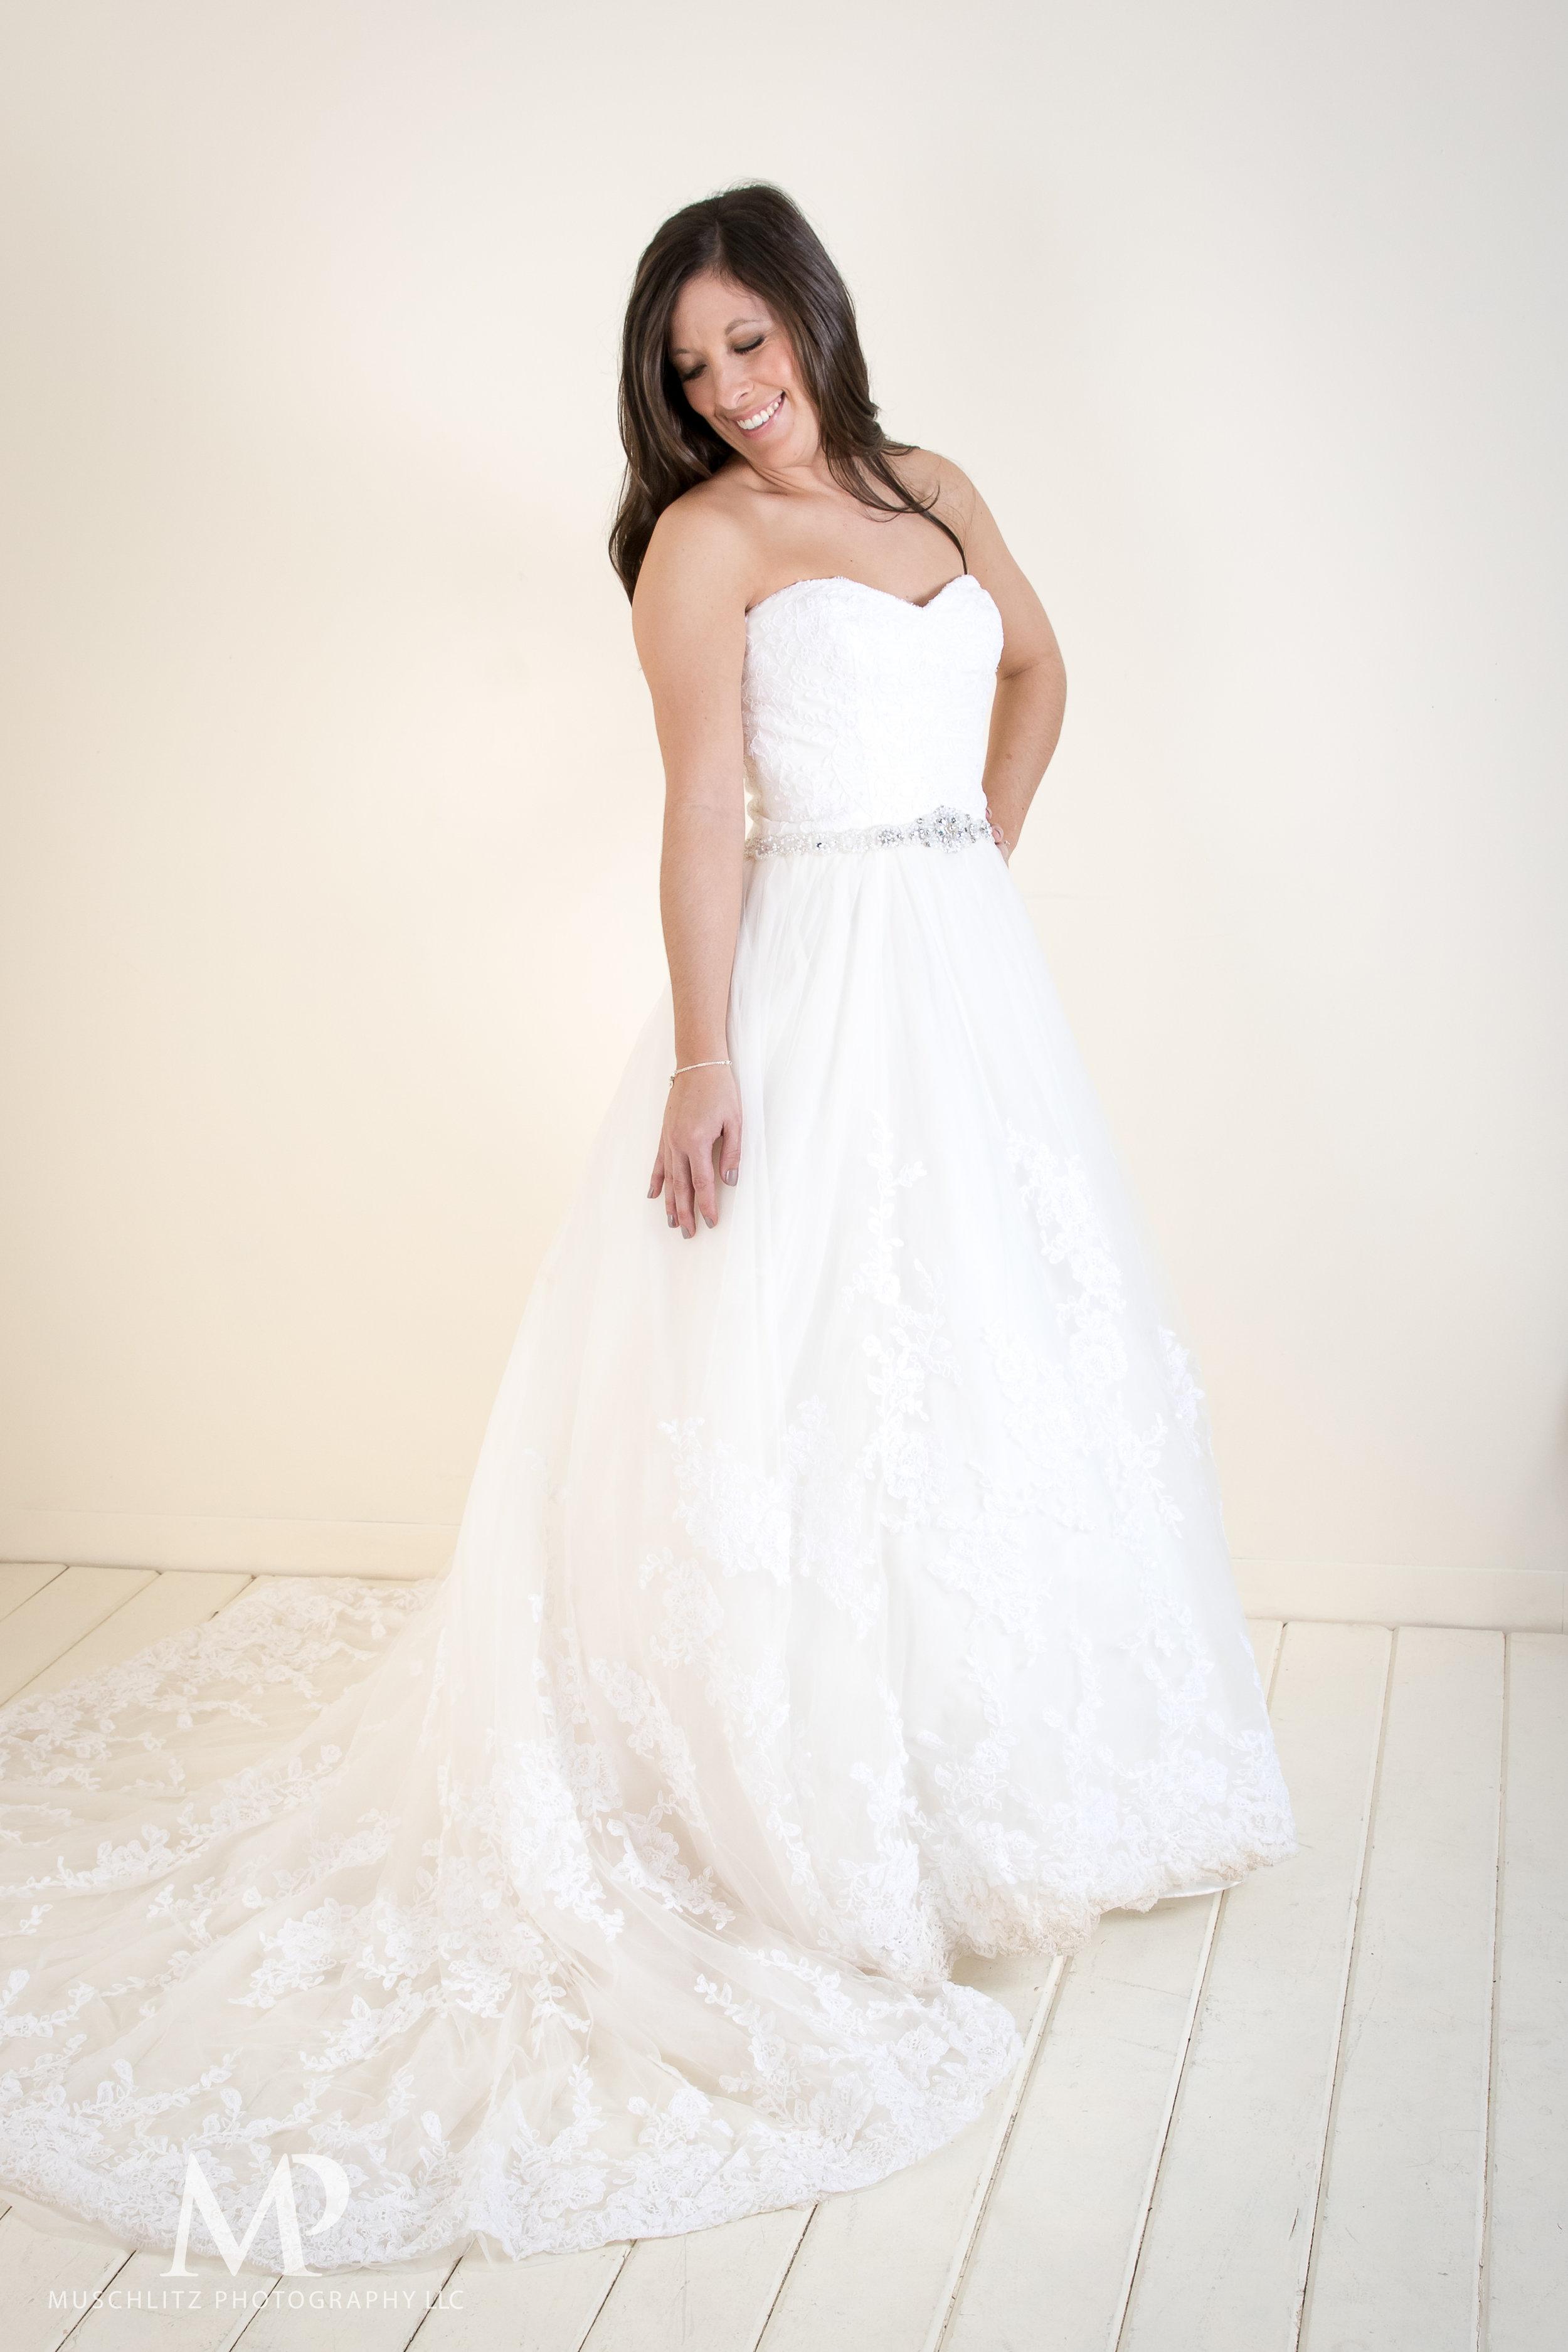 beauty-bridal-glam-the-dress-portraits-photographer-studio-columbus-ohio-gahanna-muschlitz-photography-018.JPG